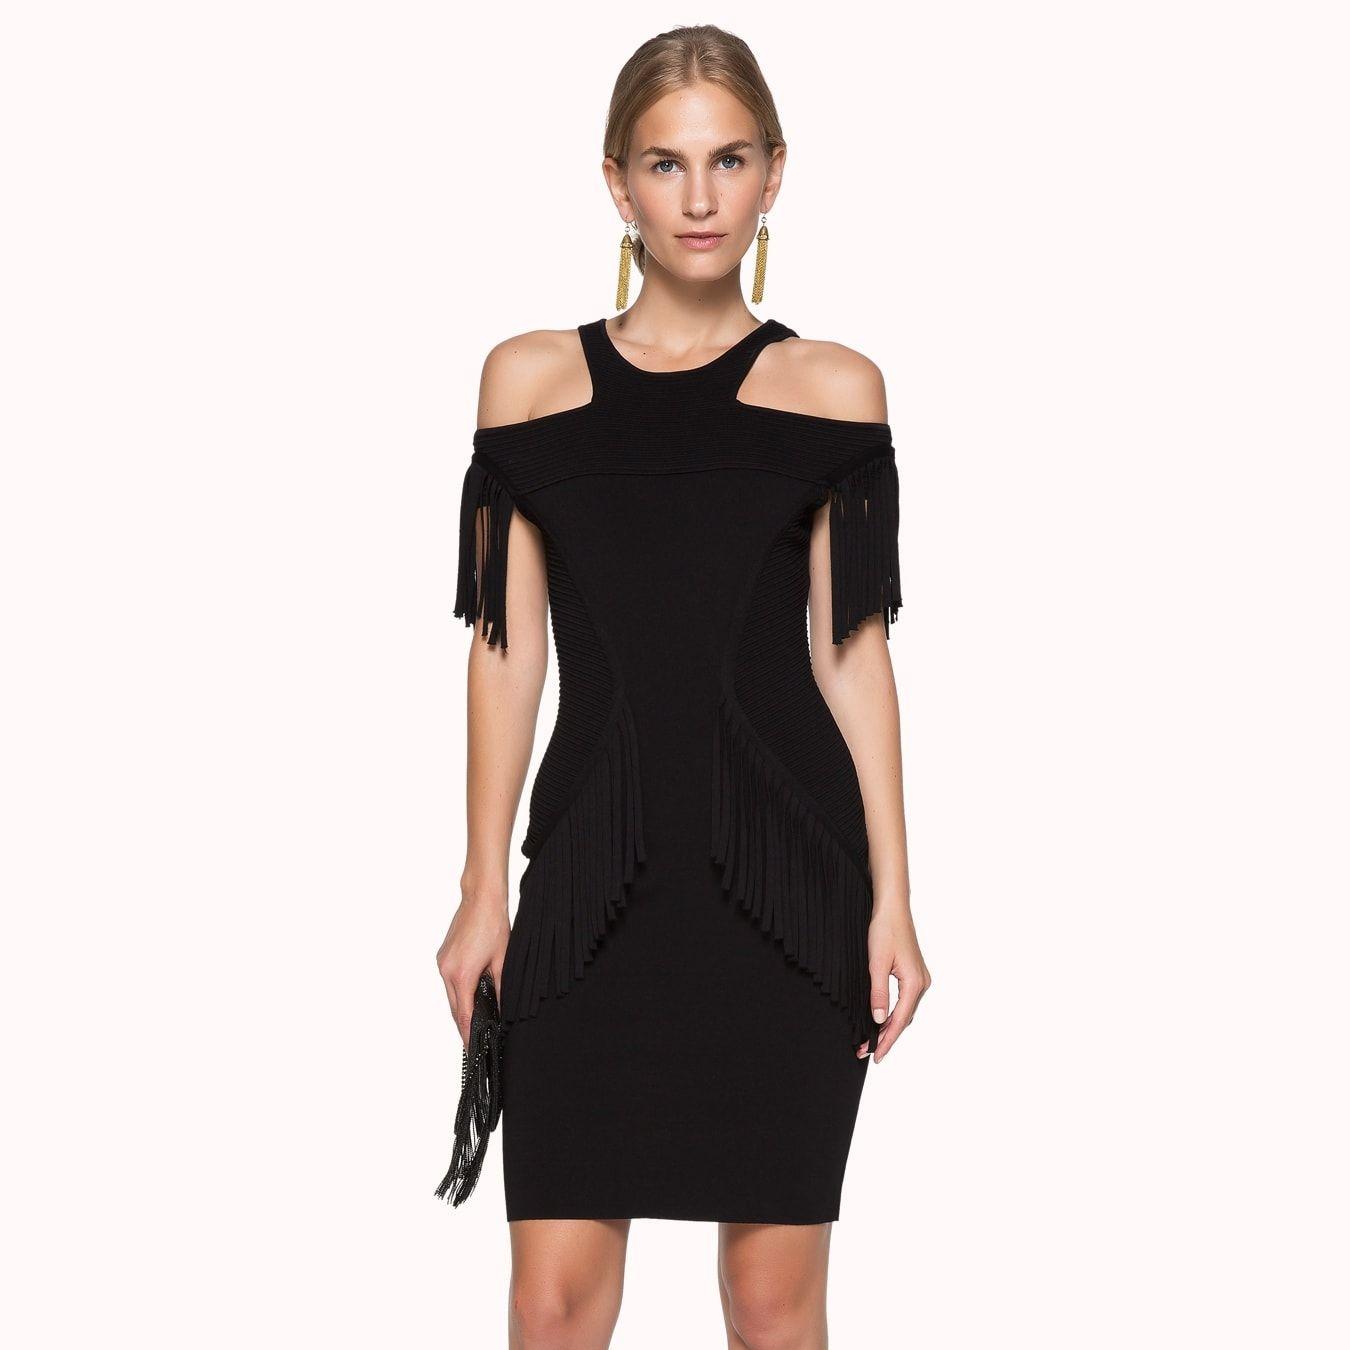 Siyah Nervur Detayli Omuz Dekolteli Puskullu Elbise Elbise Elbise Modelleri Kisa Elbise